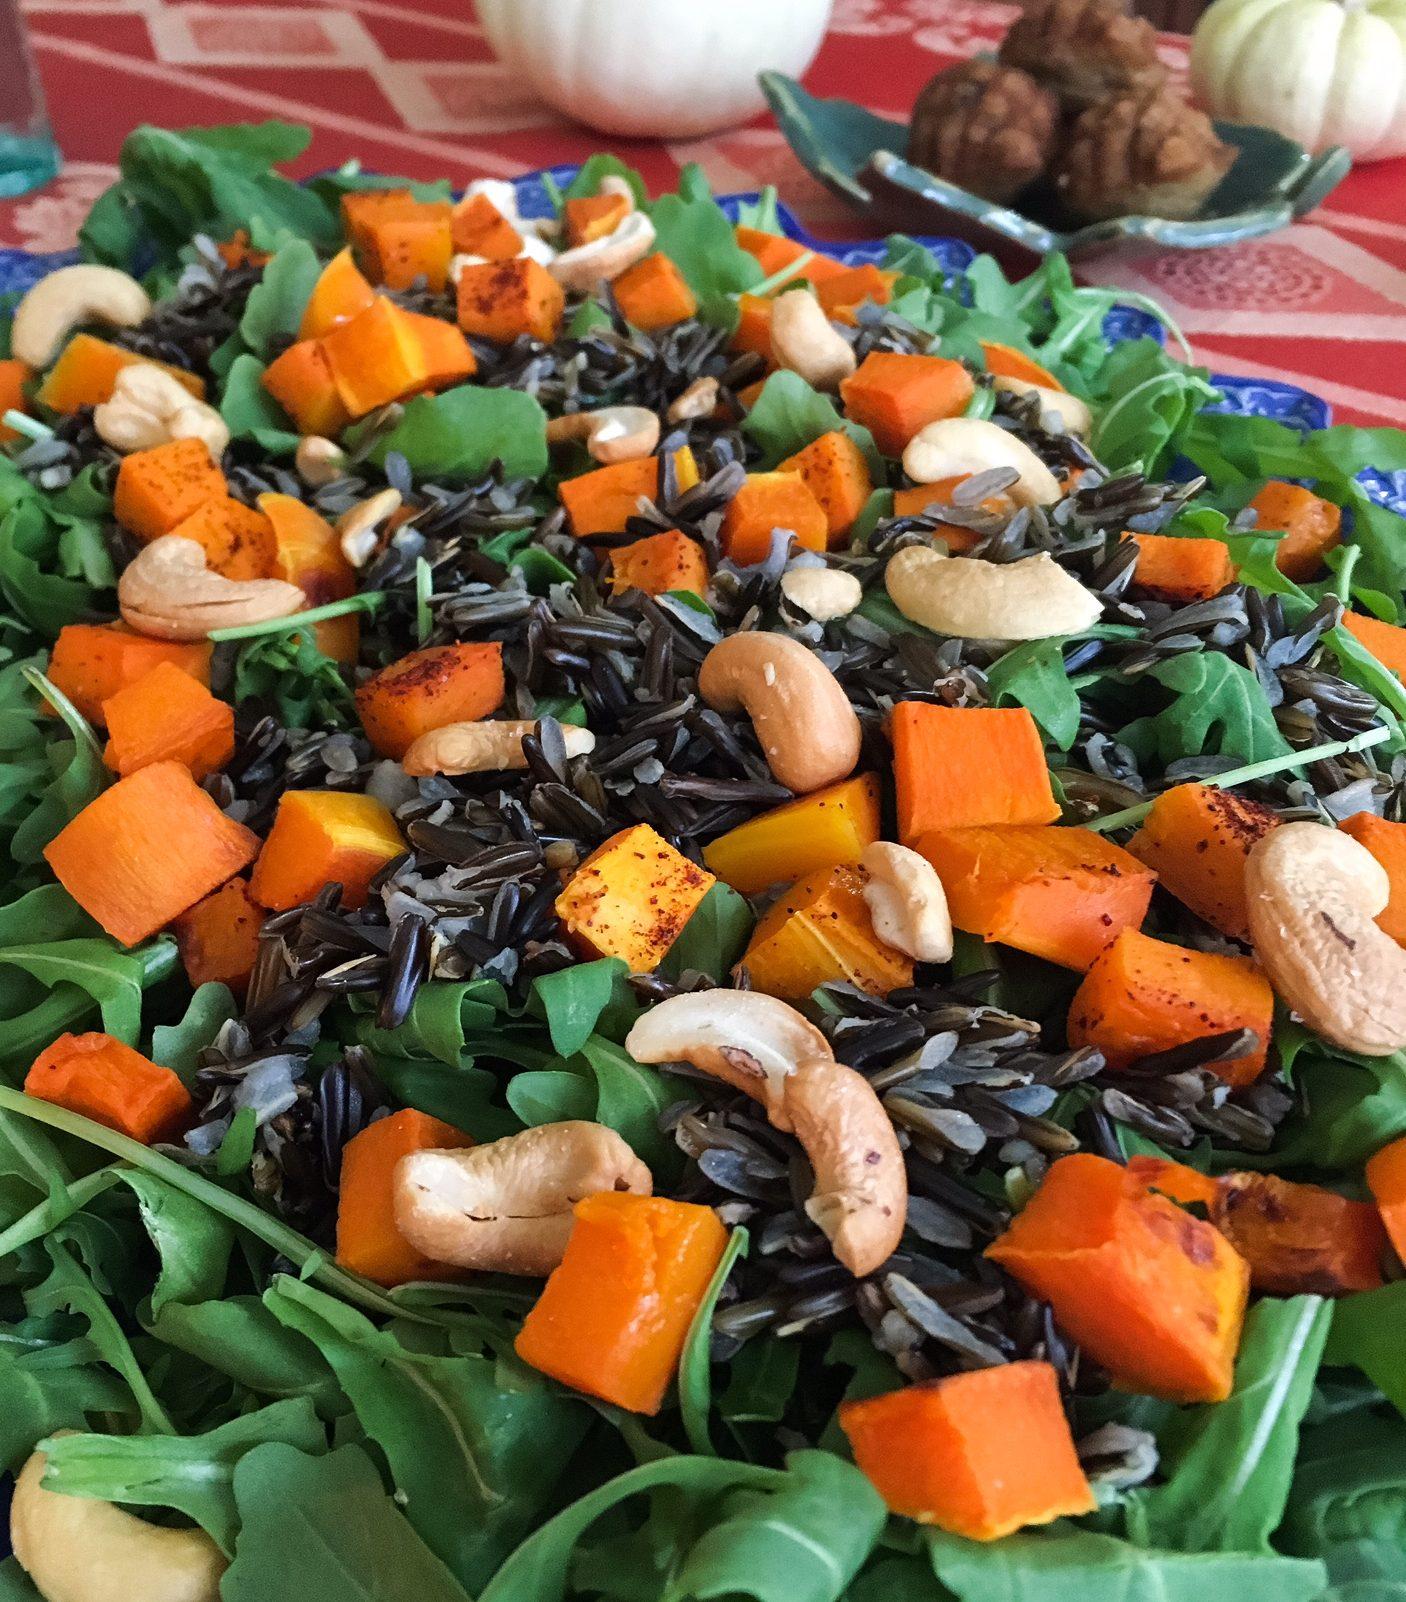 arugula, butternut squash, arugula salad, salad, black rice, cashews, squash, fall, fall salad, winter salad